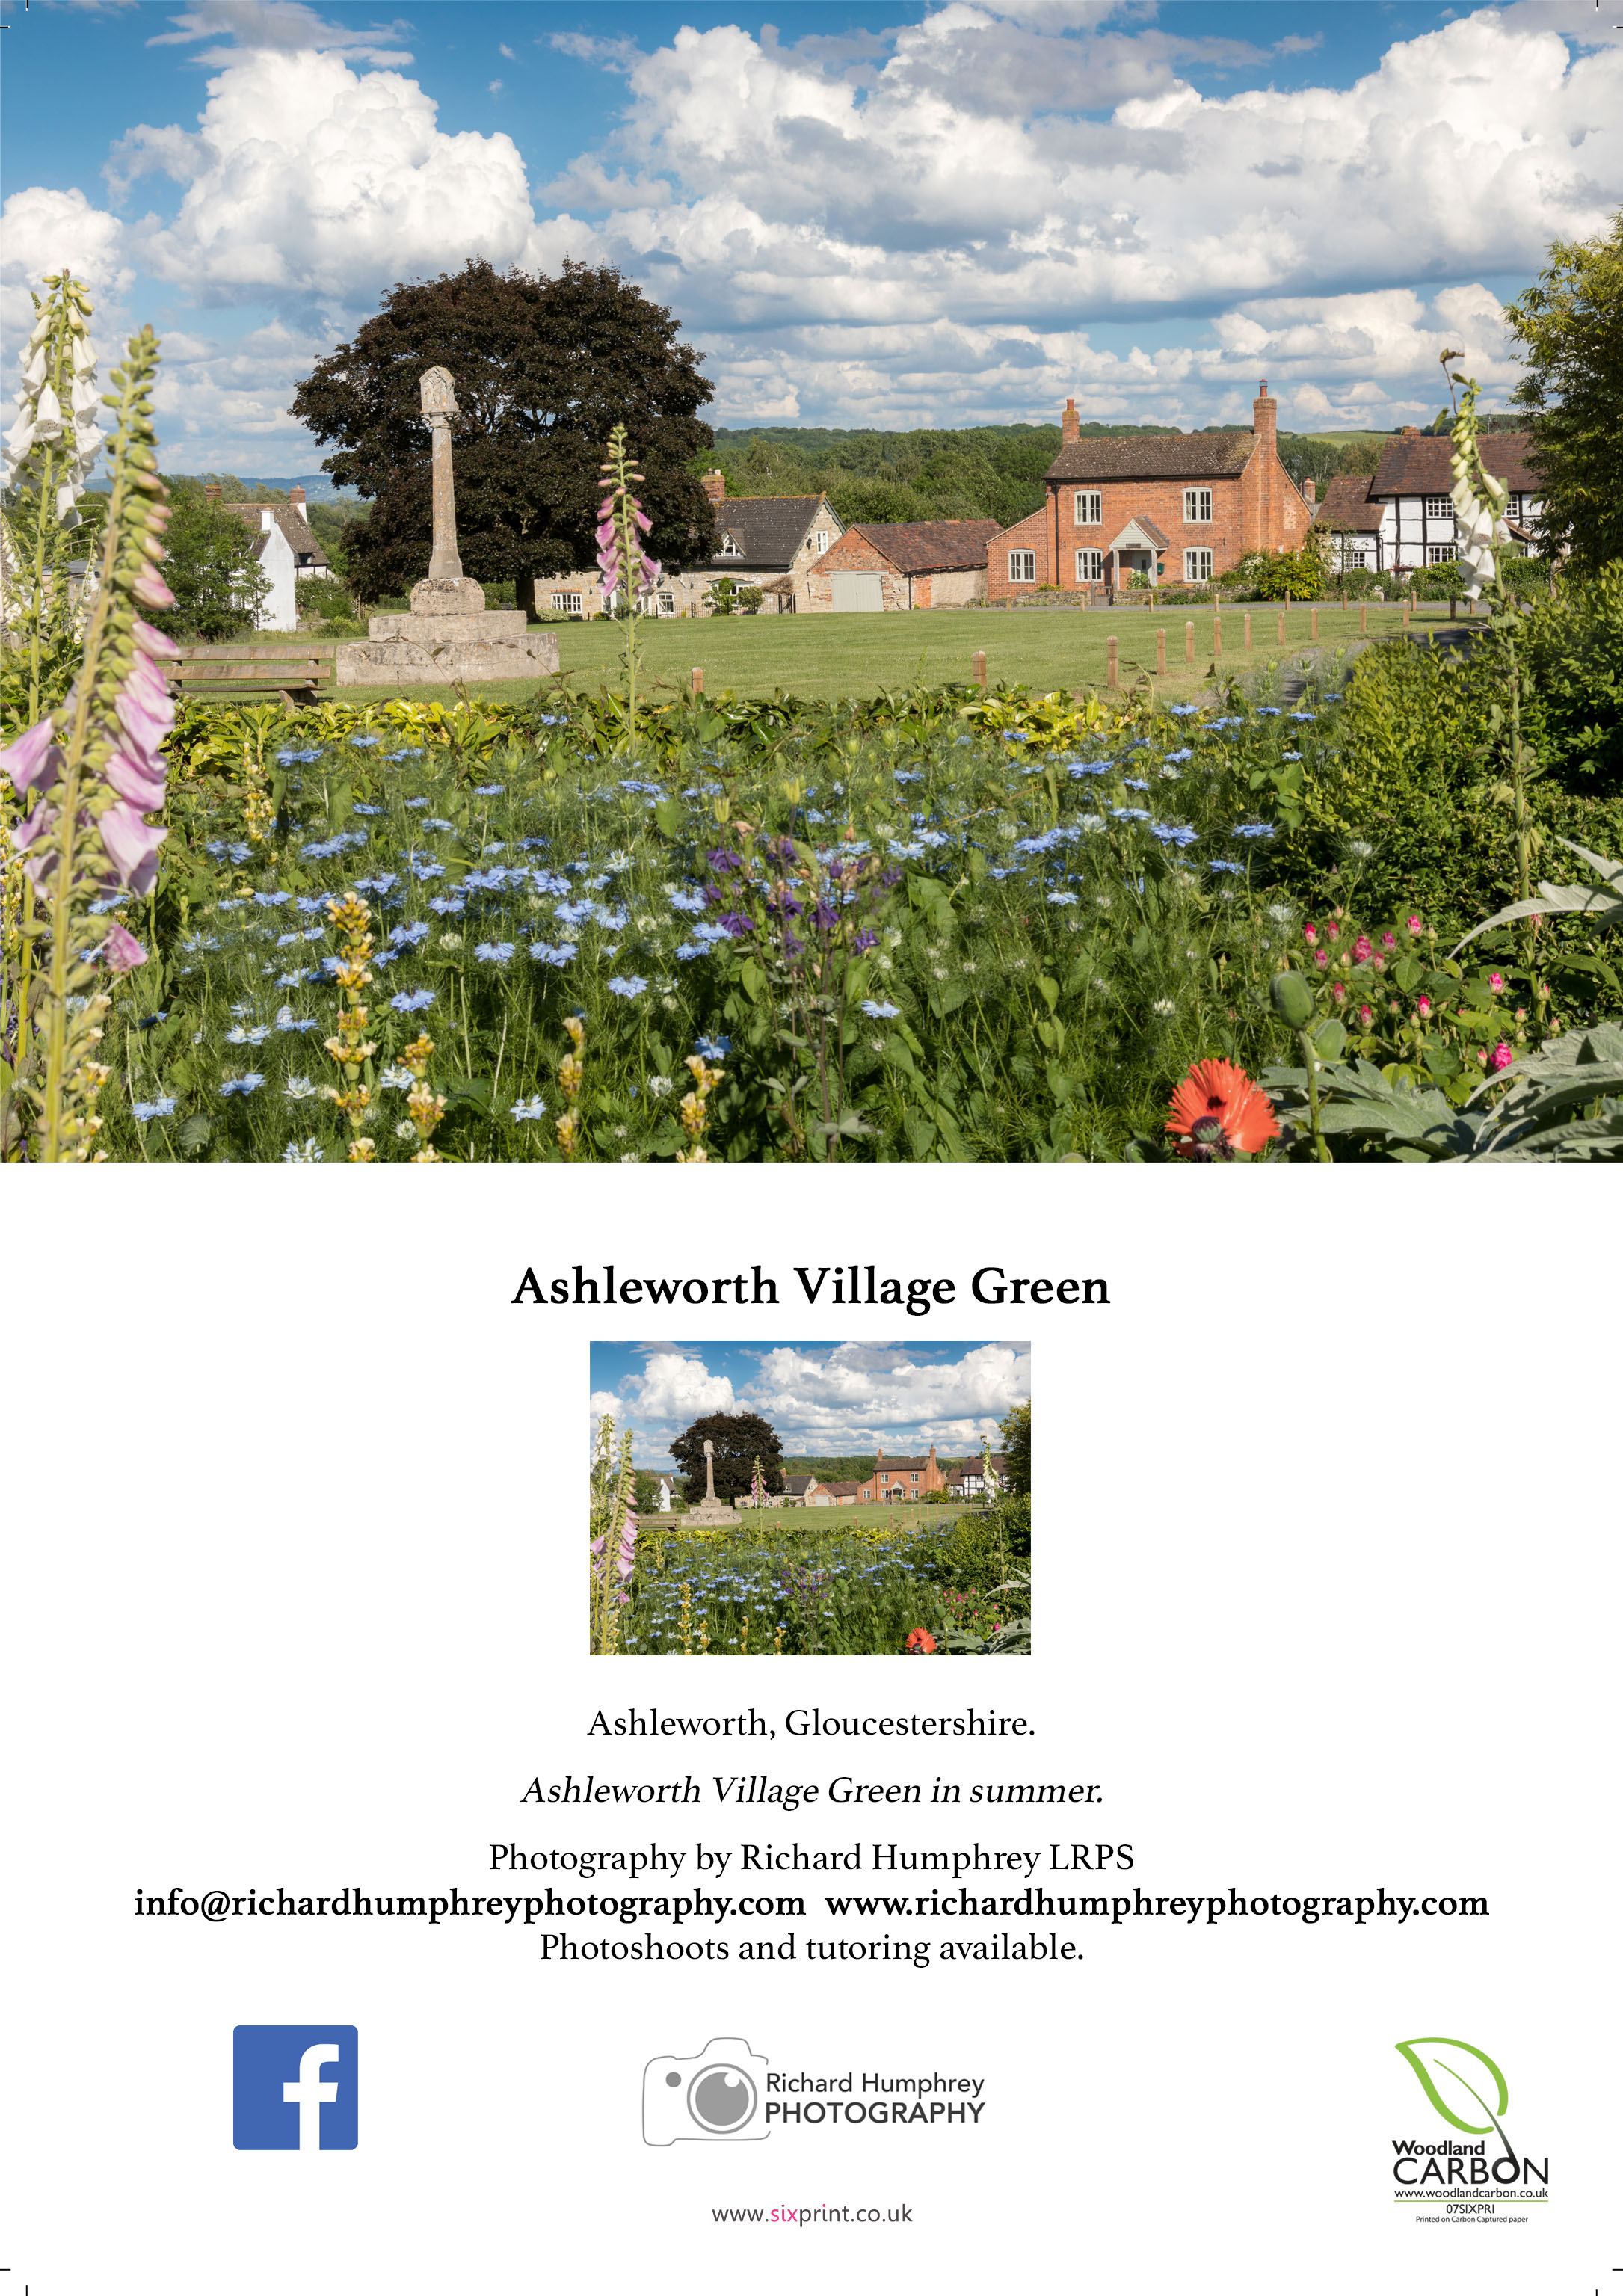 Ashleworth Village Green